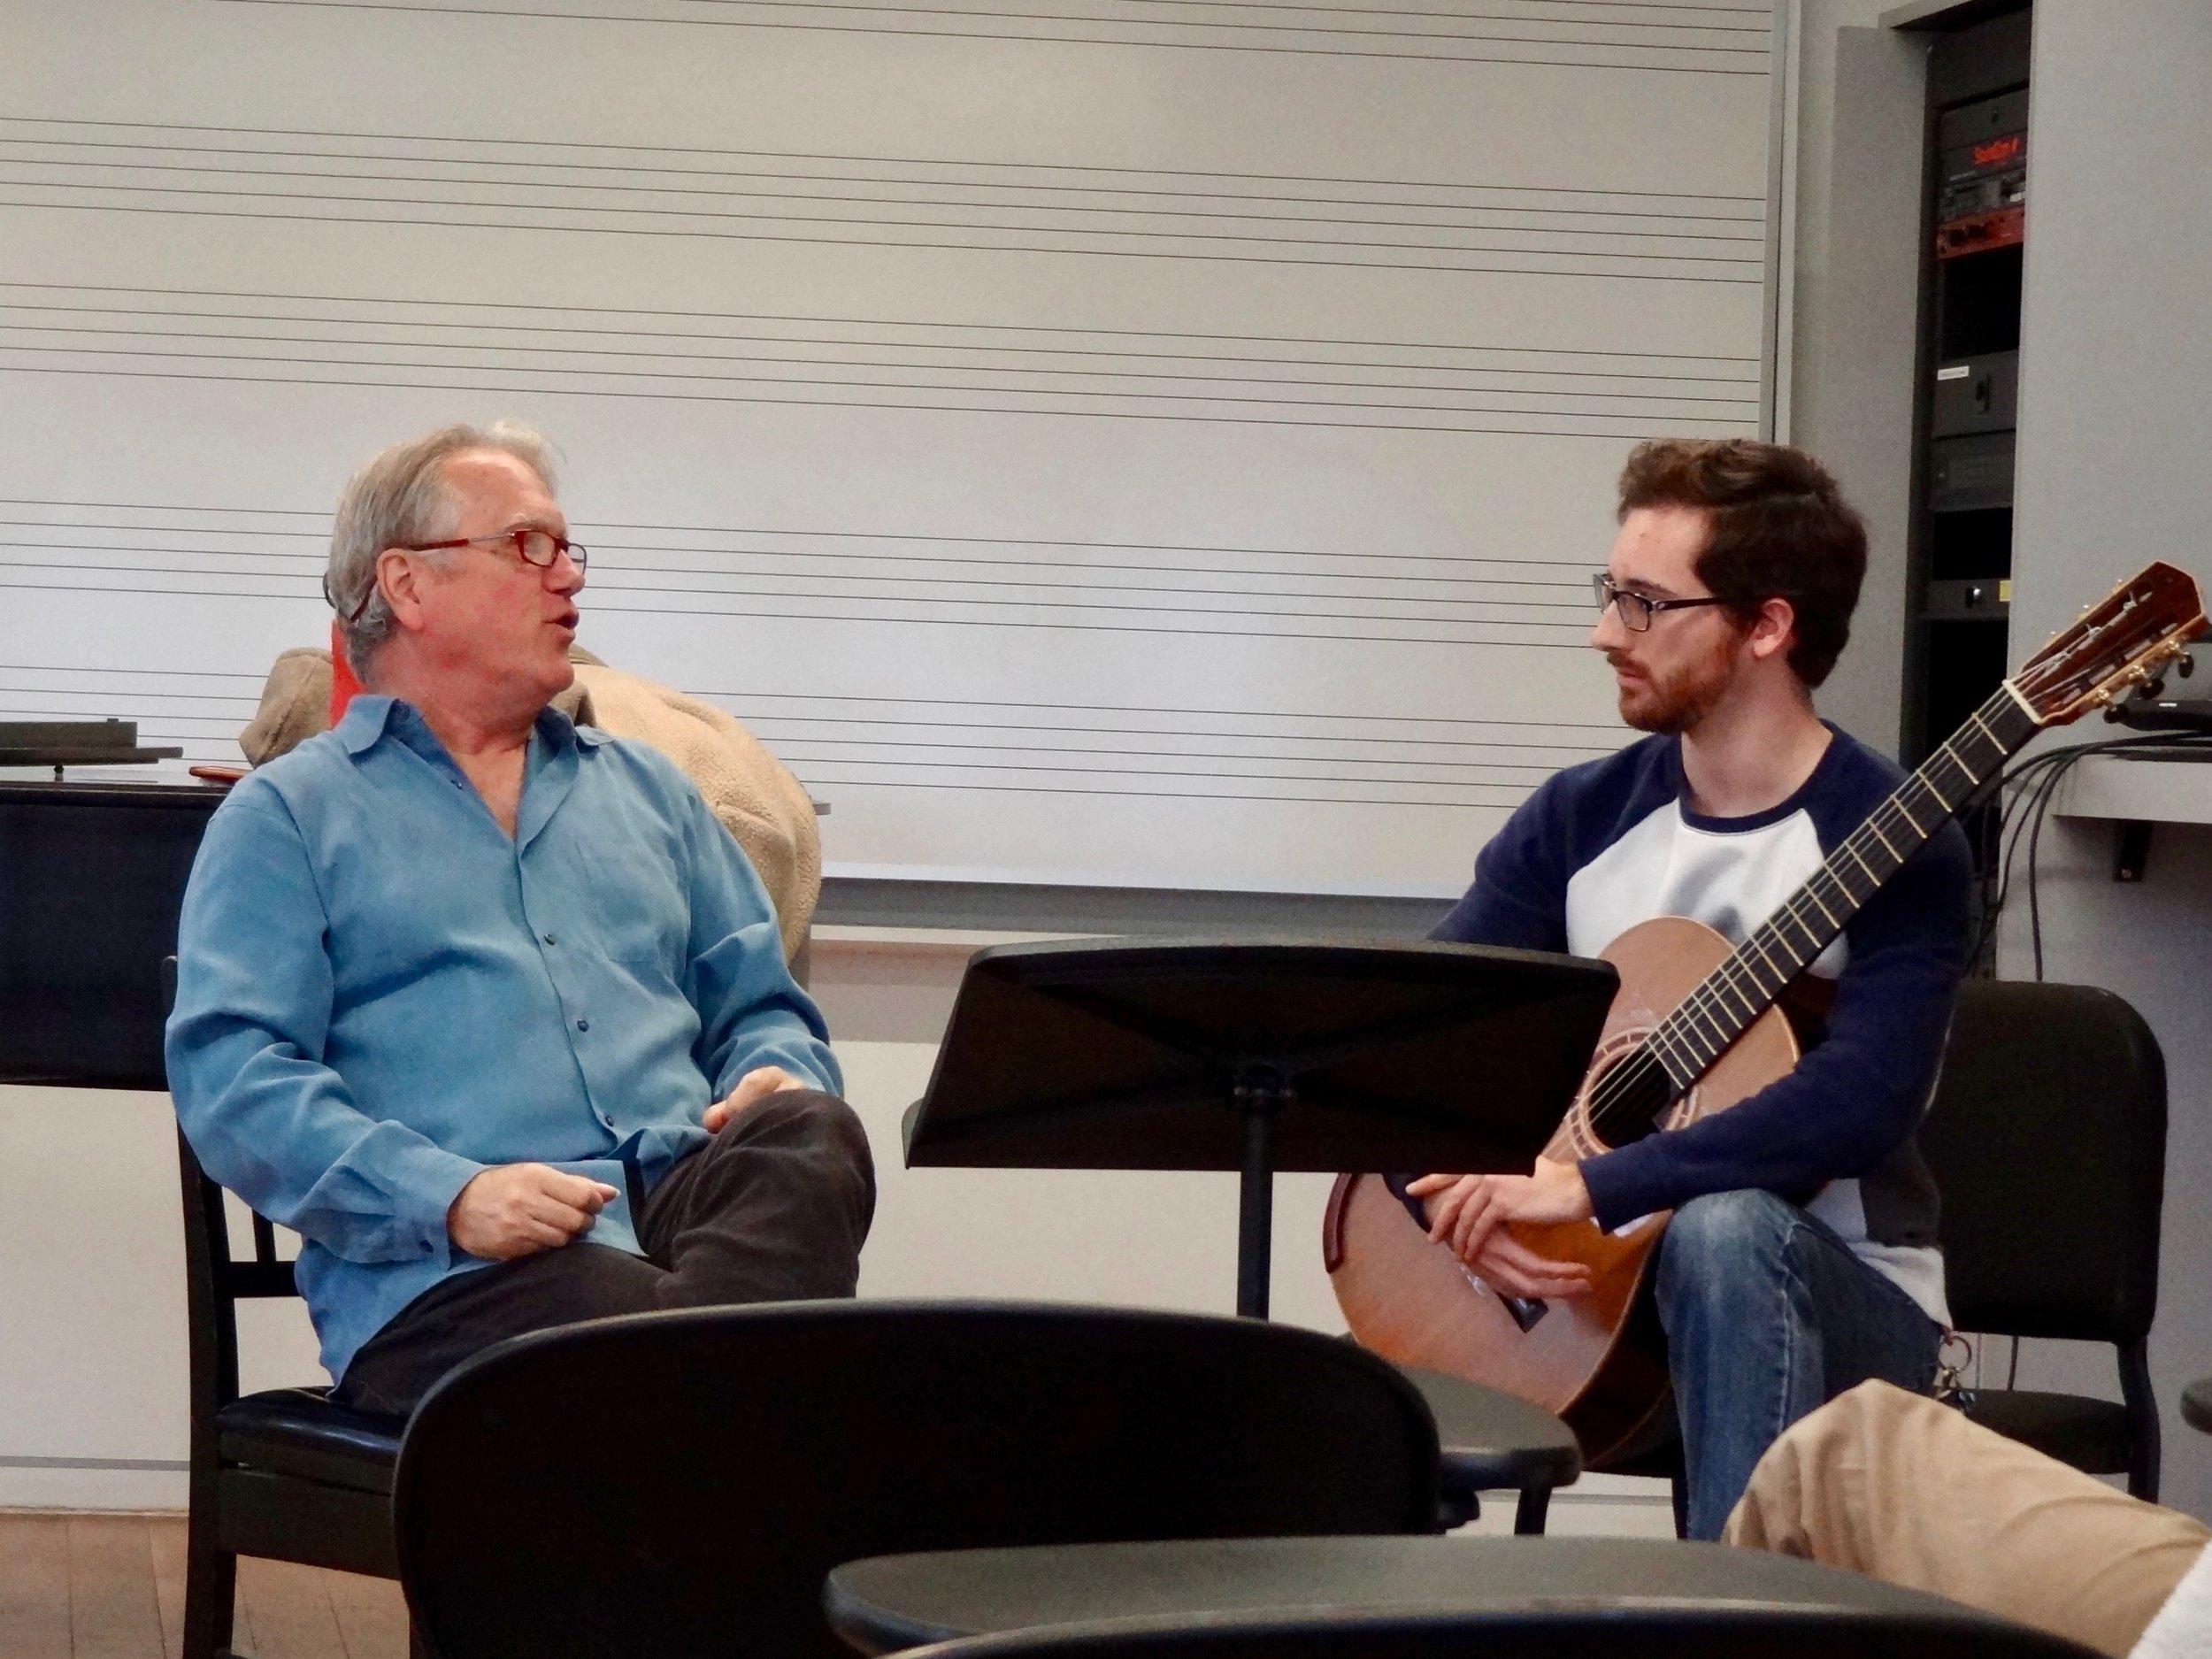 Senior, Brian King played the Passacaglia from Rodrigo's Three Spanish Pieces